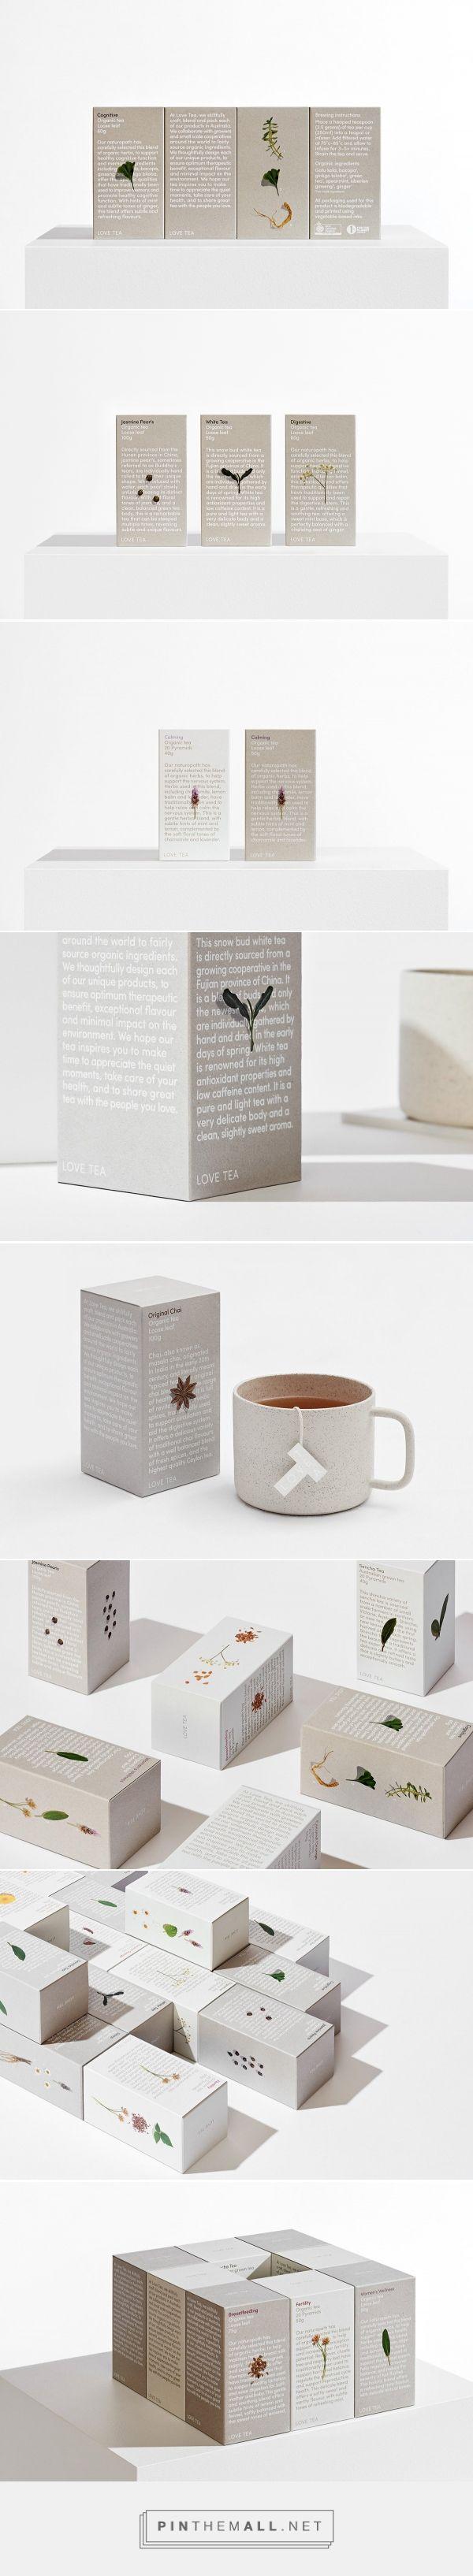 The Company You Keep: Love Tea | North East - created via https://pinthemall.net